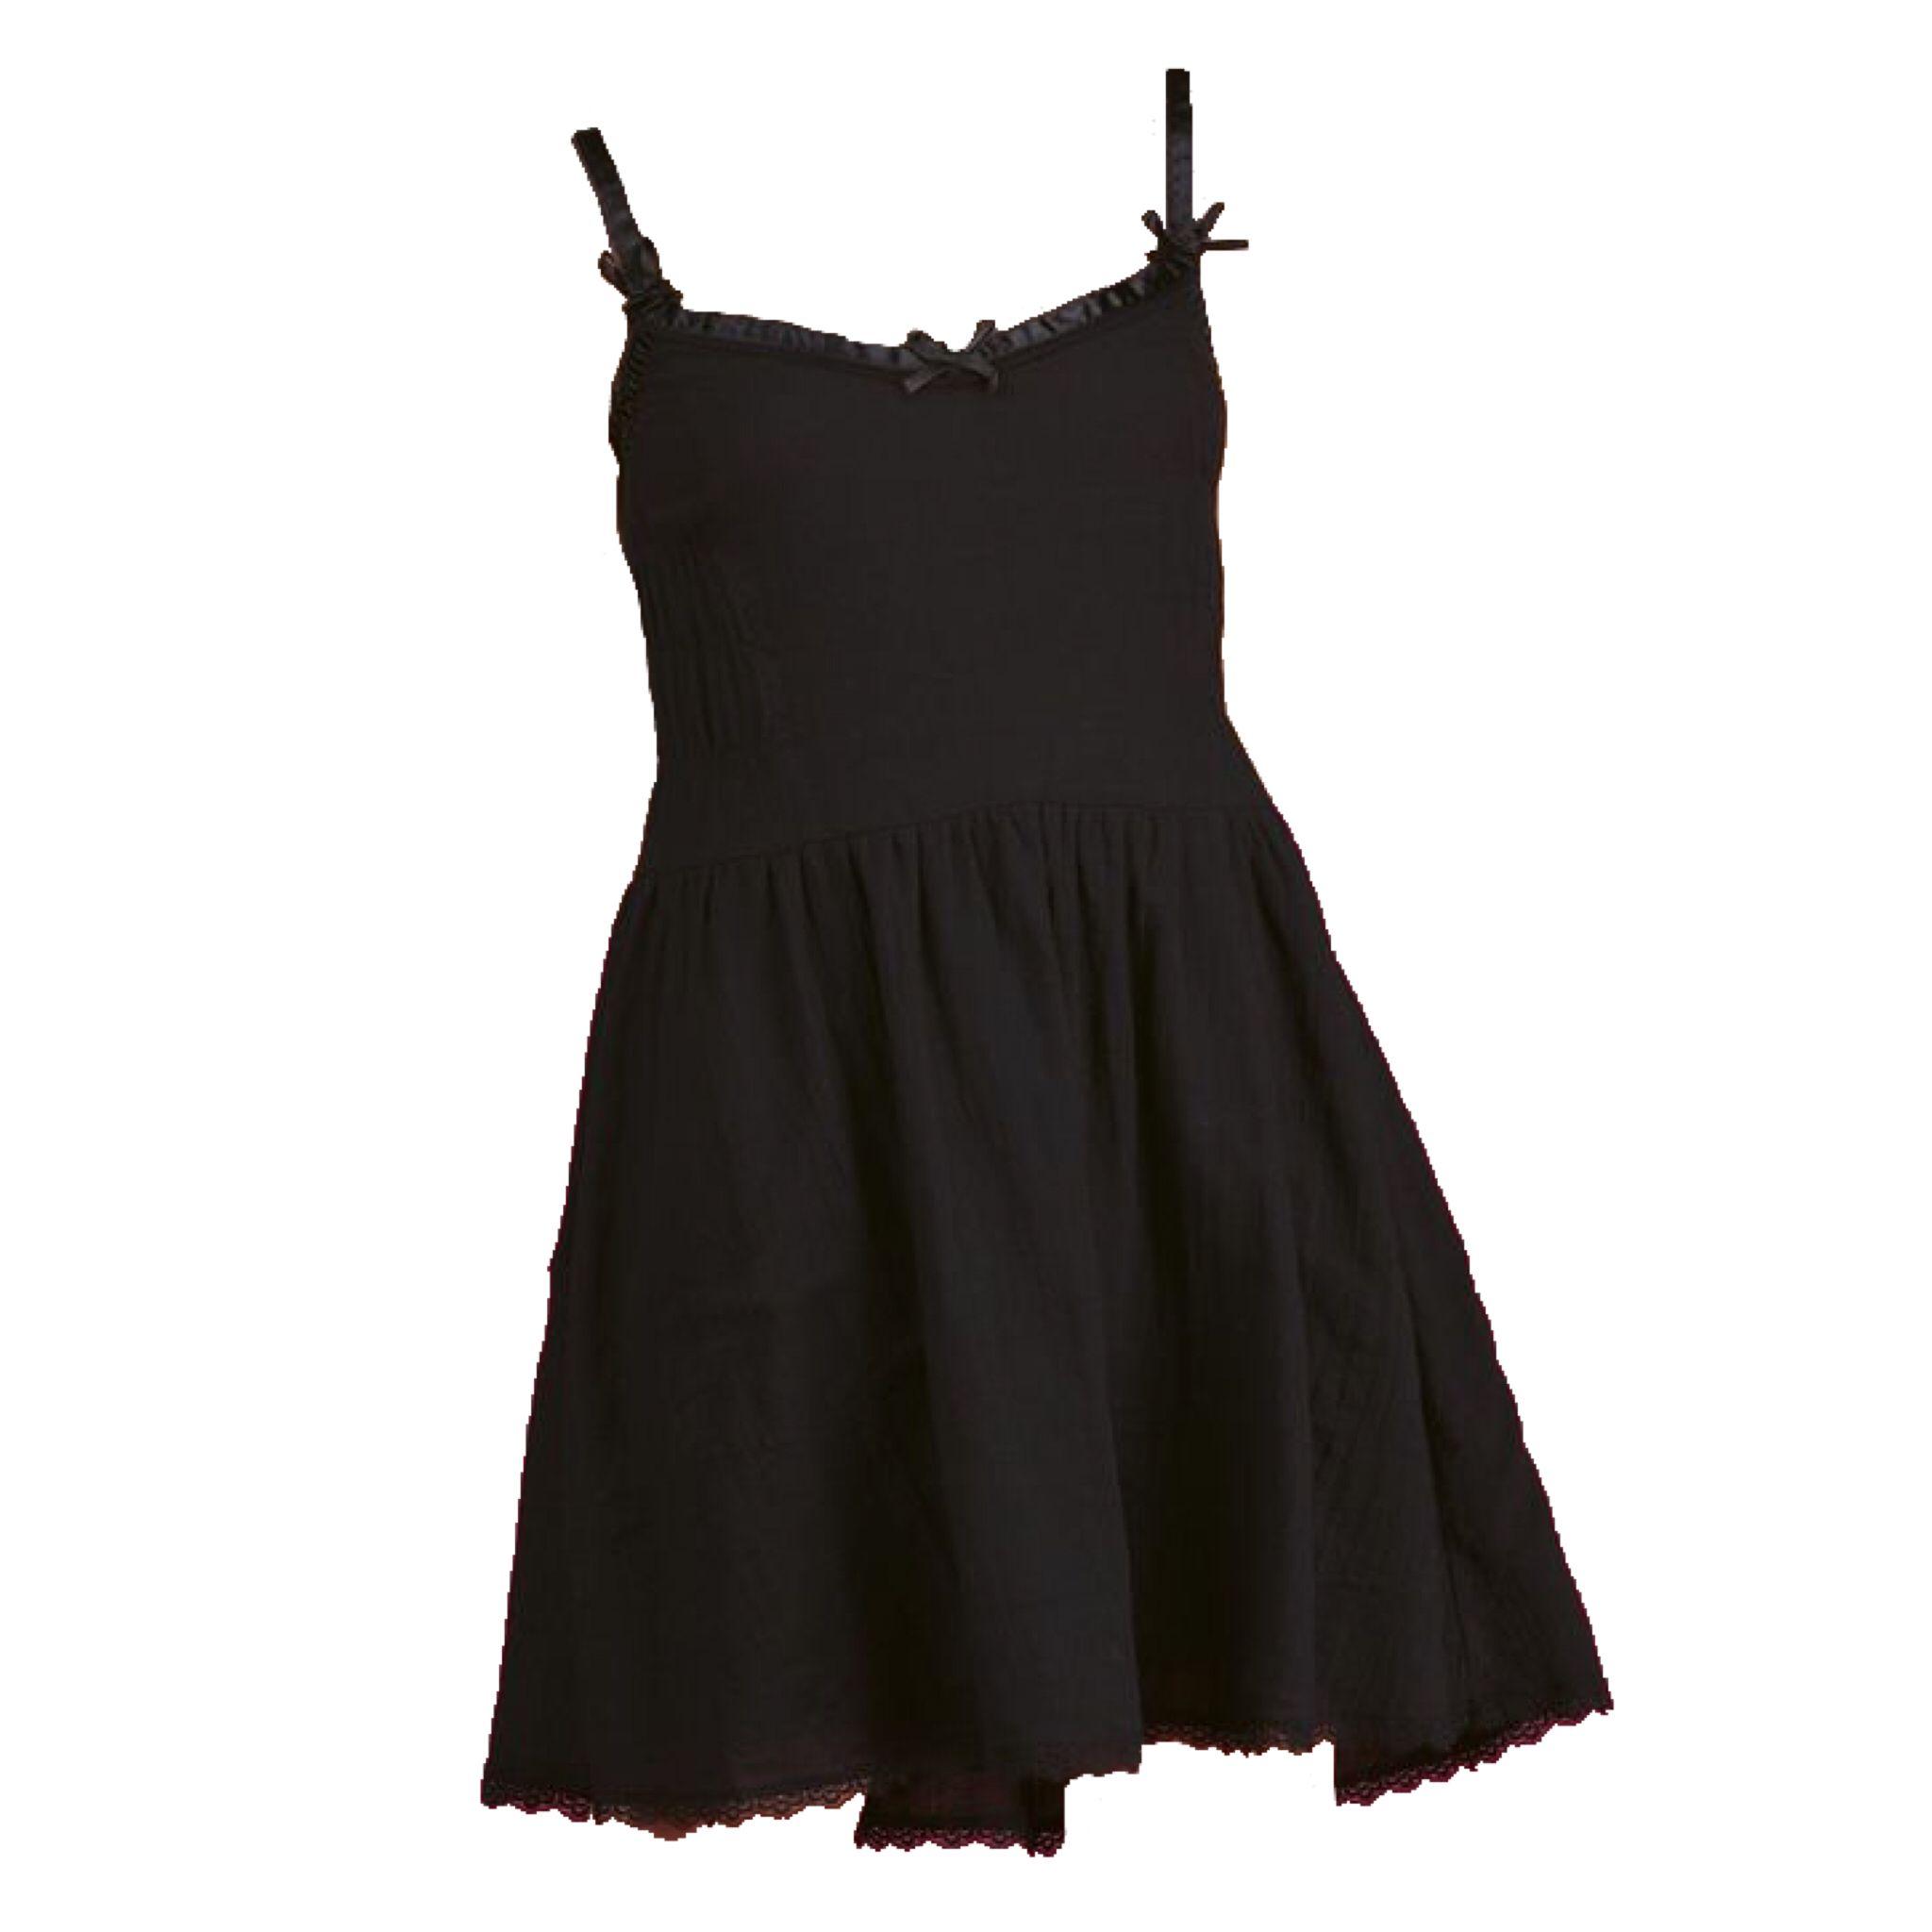 Dress Png Indie Dresses Cute Short Dresses Black Dress Outfits